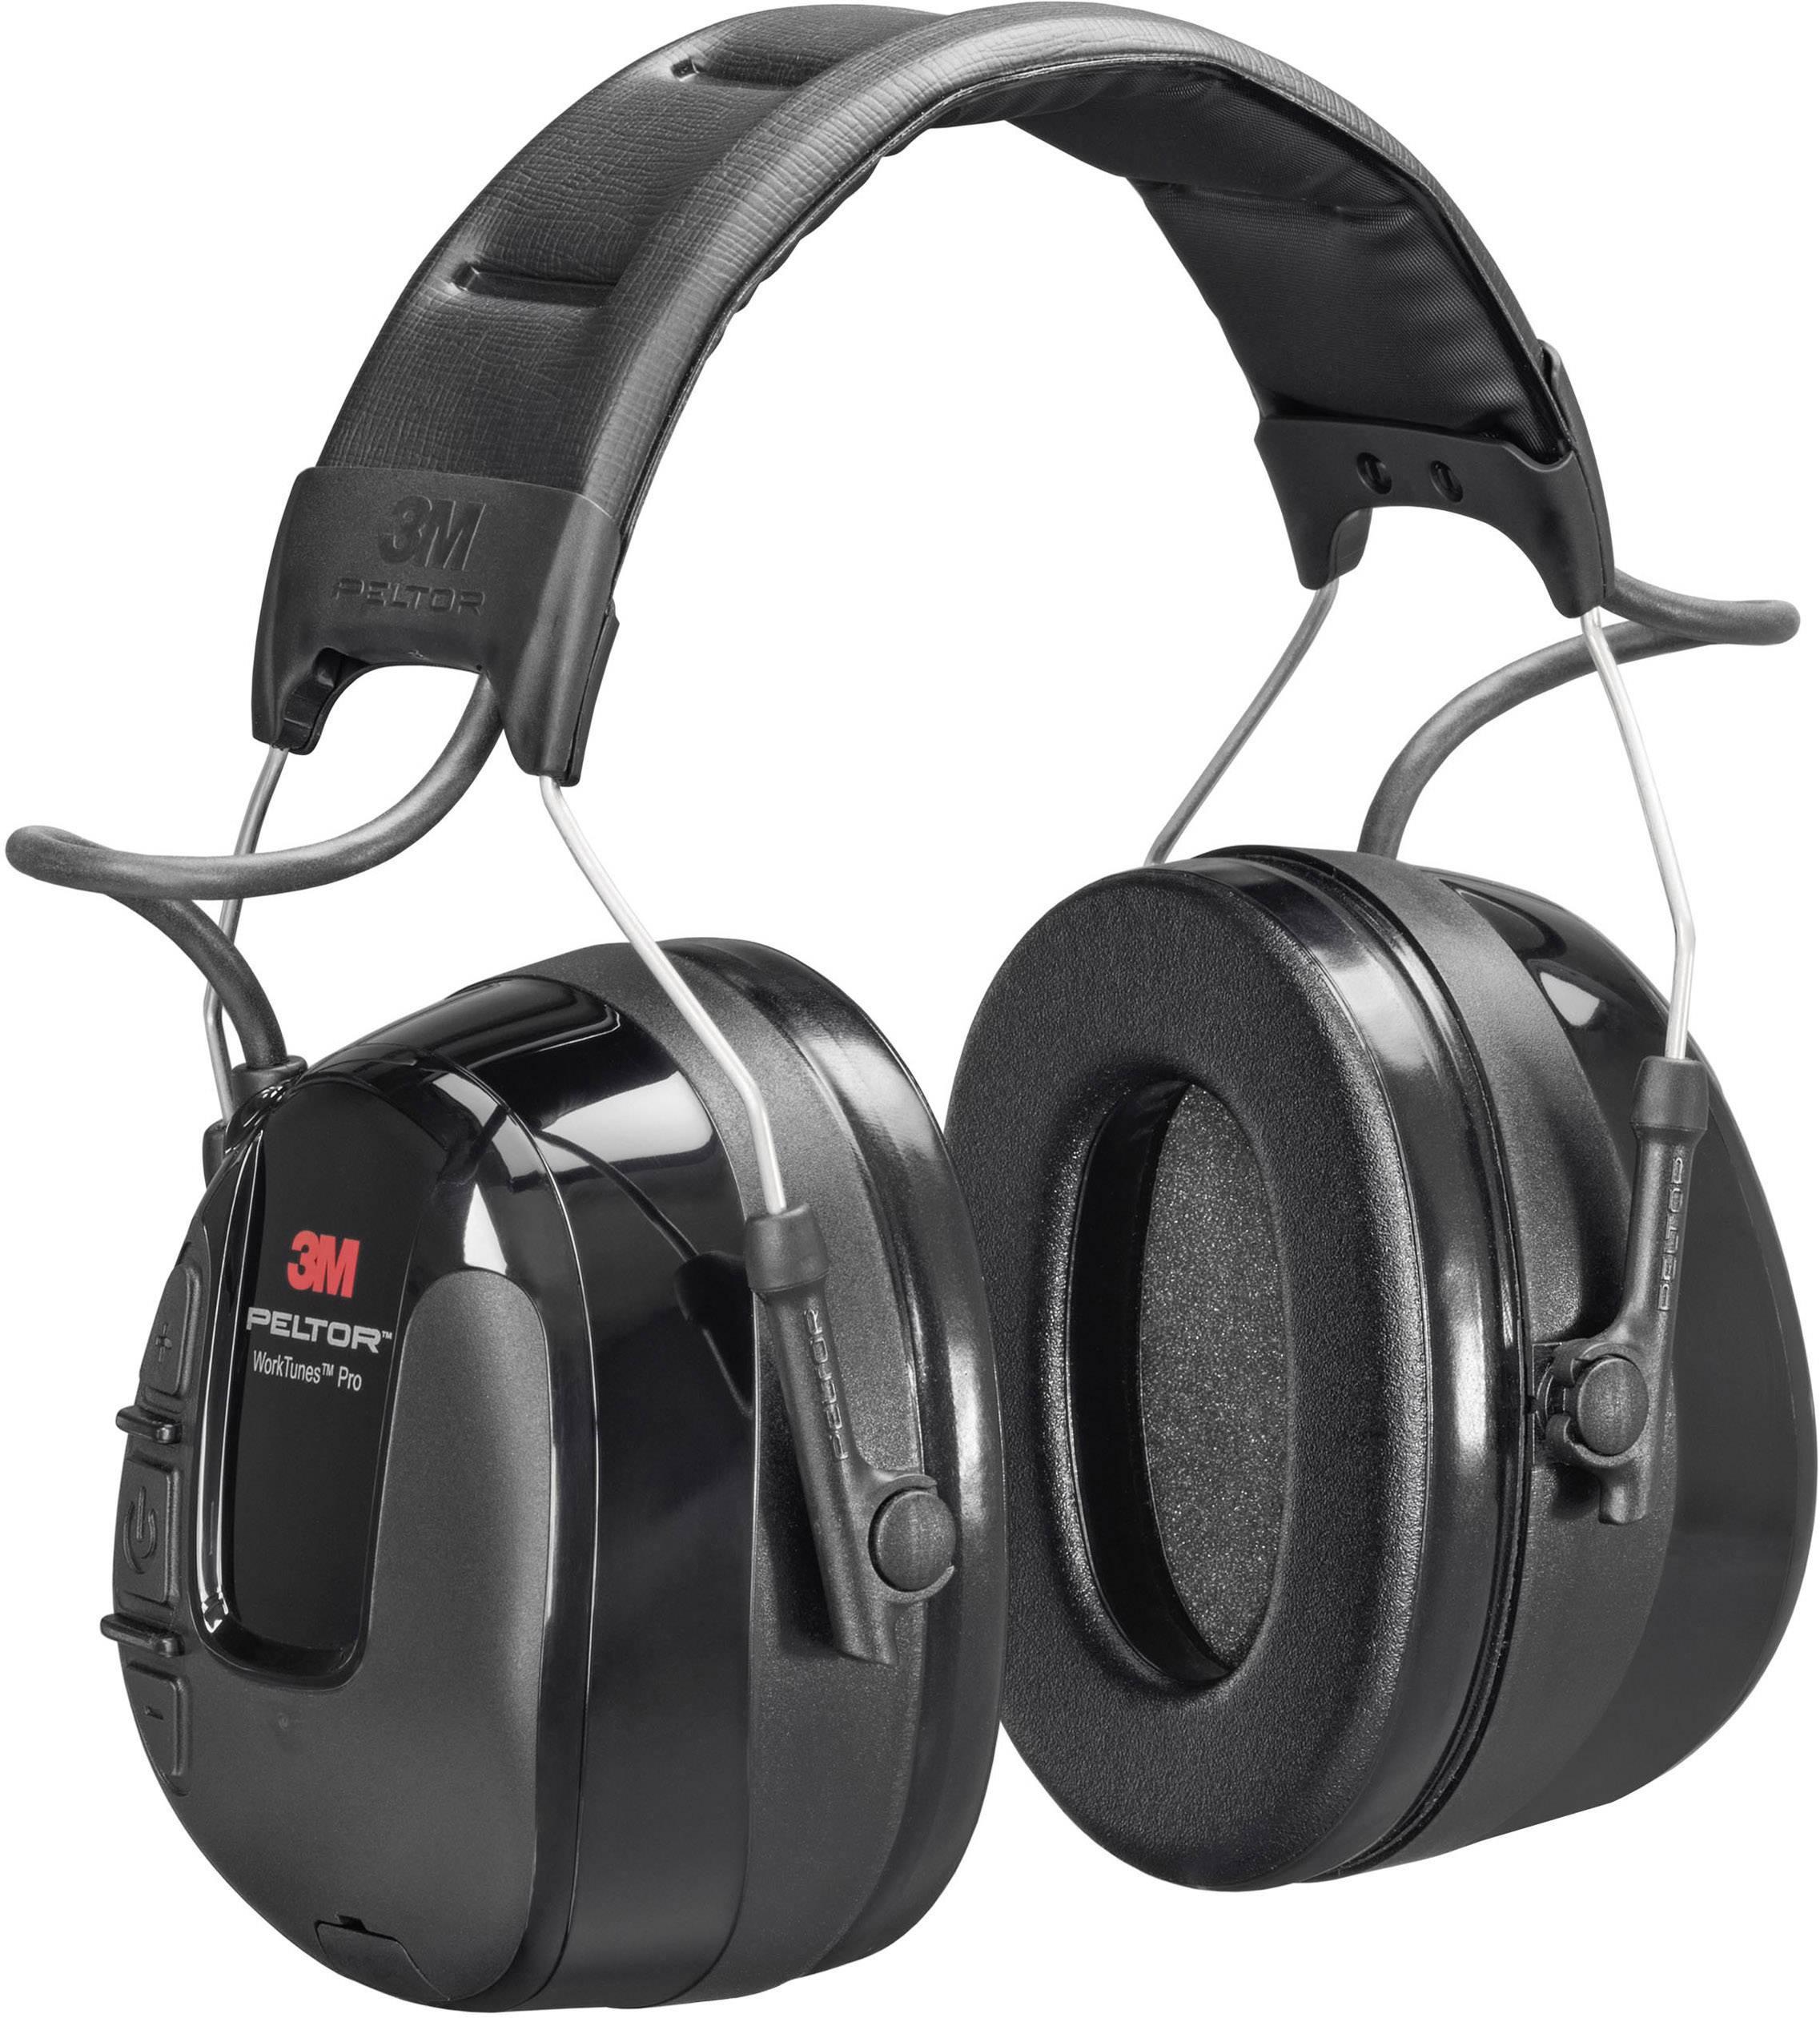 Headset s mušlovými chrániči sluchu 3M Peltor WorkTunes Pro HRXS220A, 32 dB, 1 ks